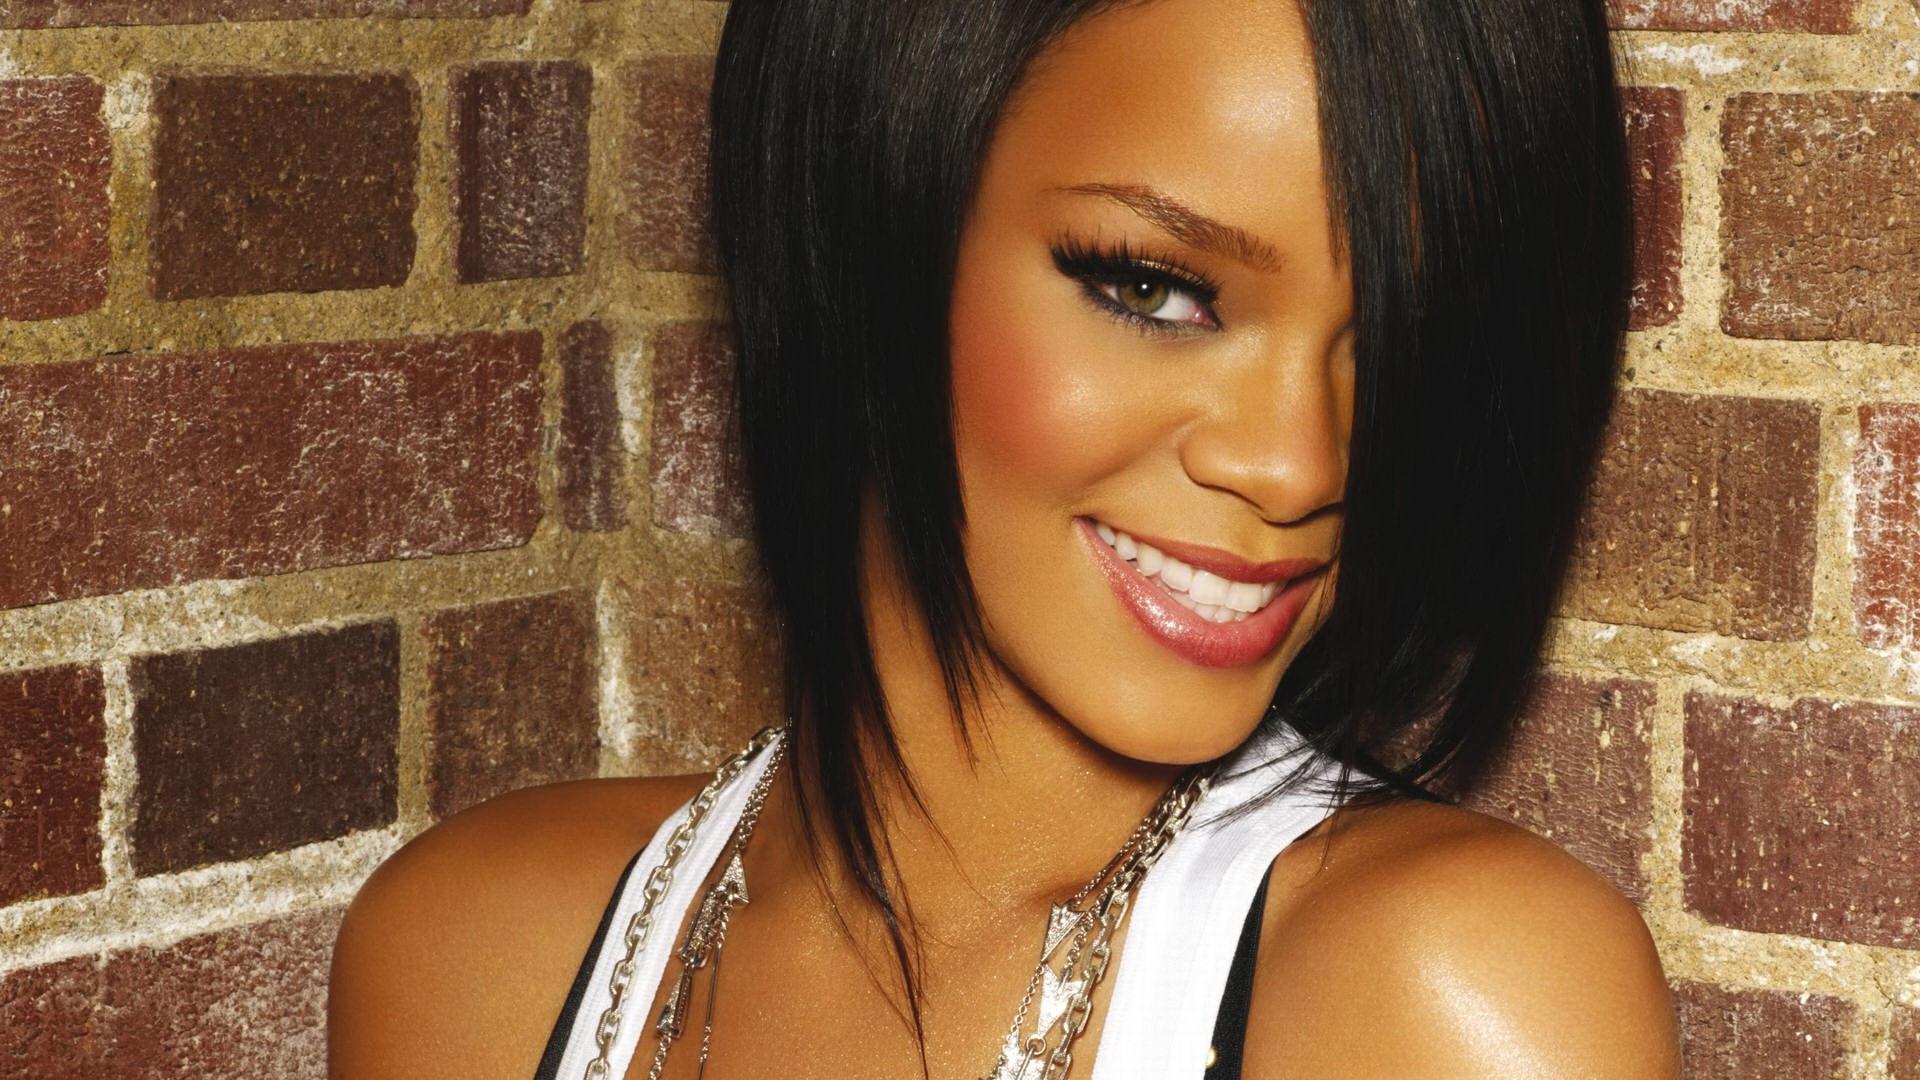 Wallpaper Long Hair Wall Black Hair Rihanna Girl Beauty